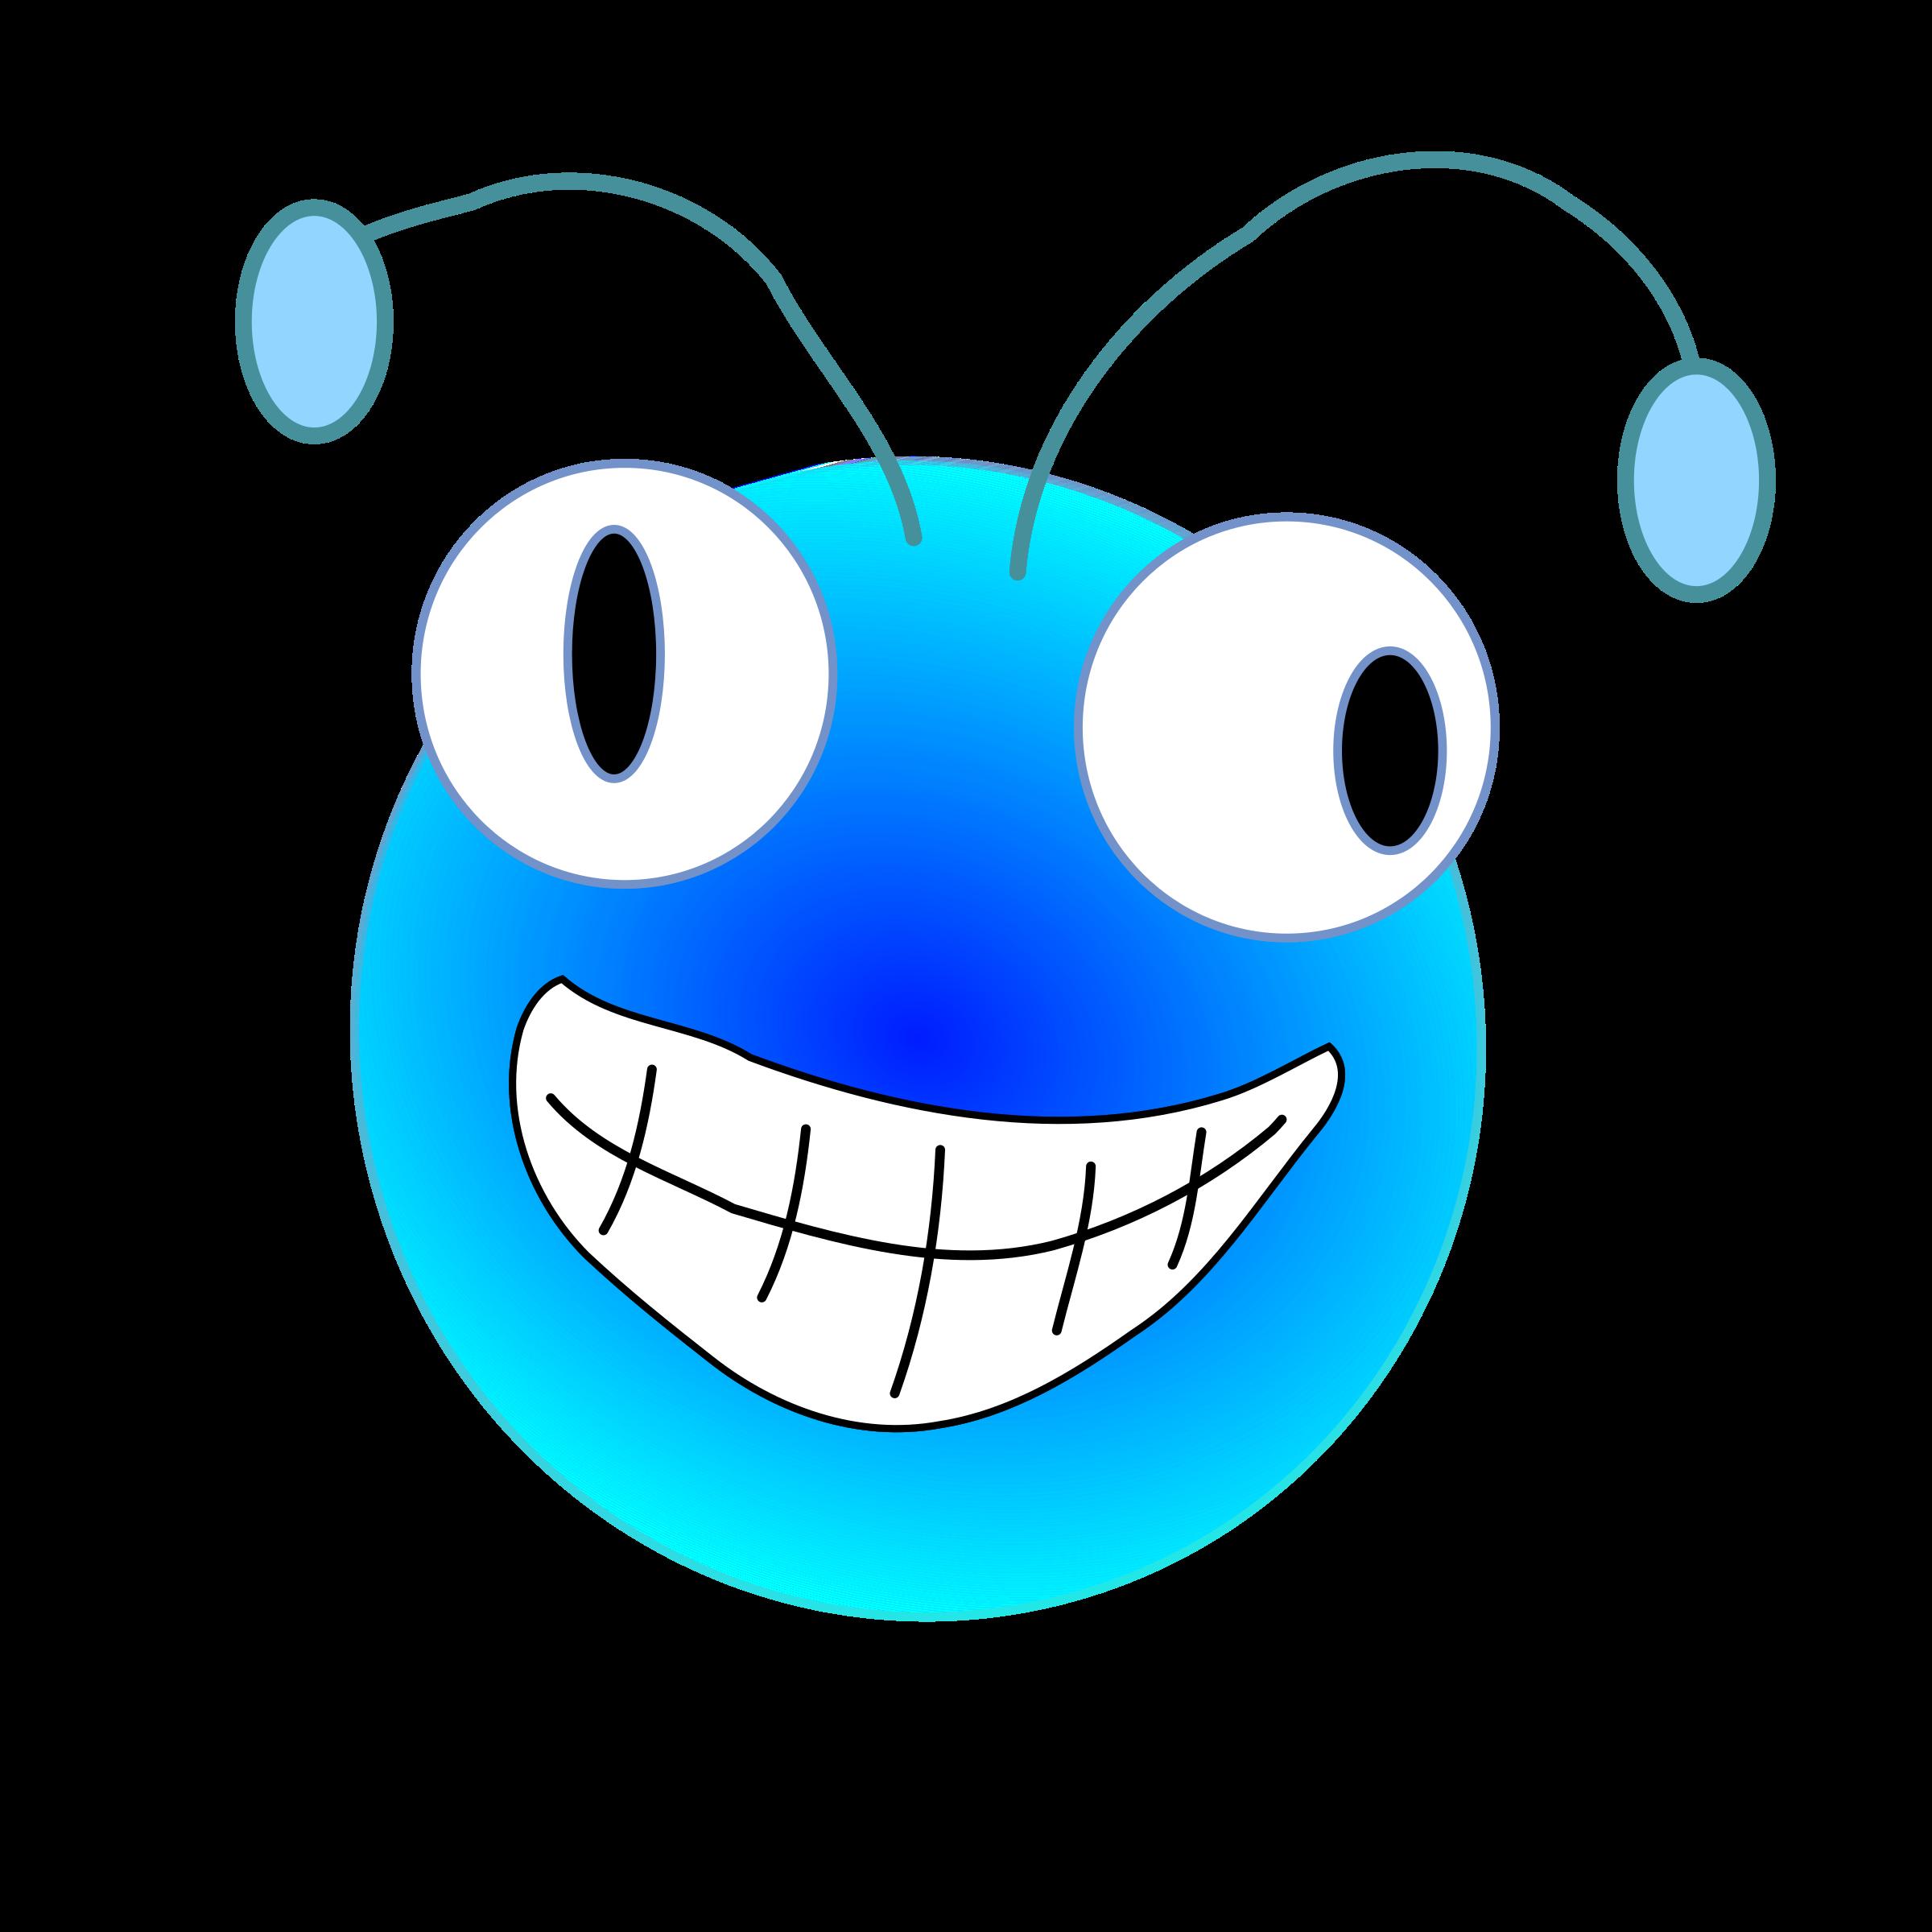 Bugs head image png. Worm clipart big eye